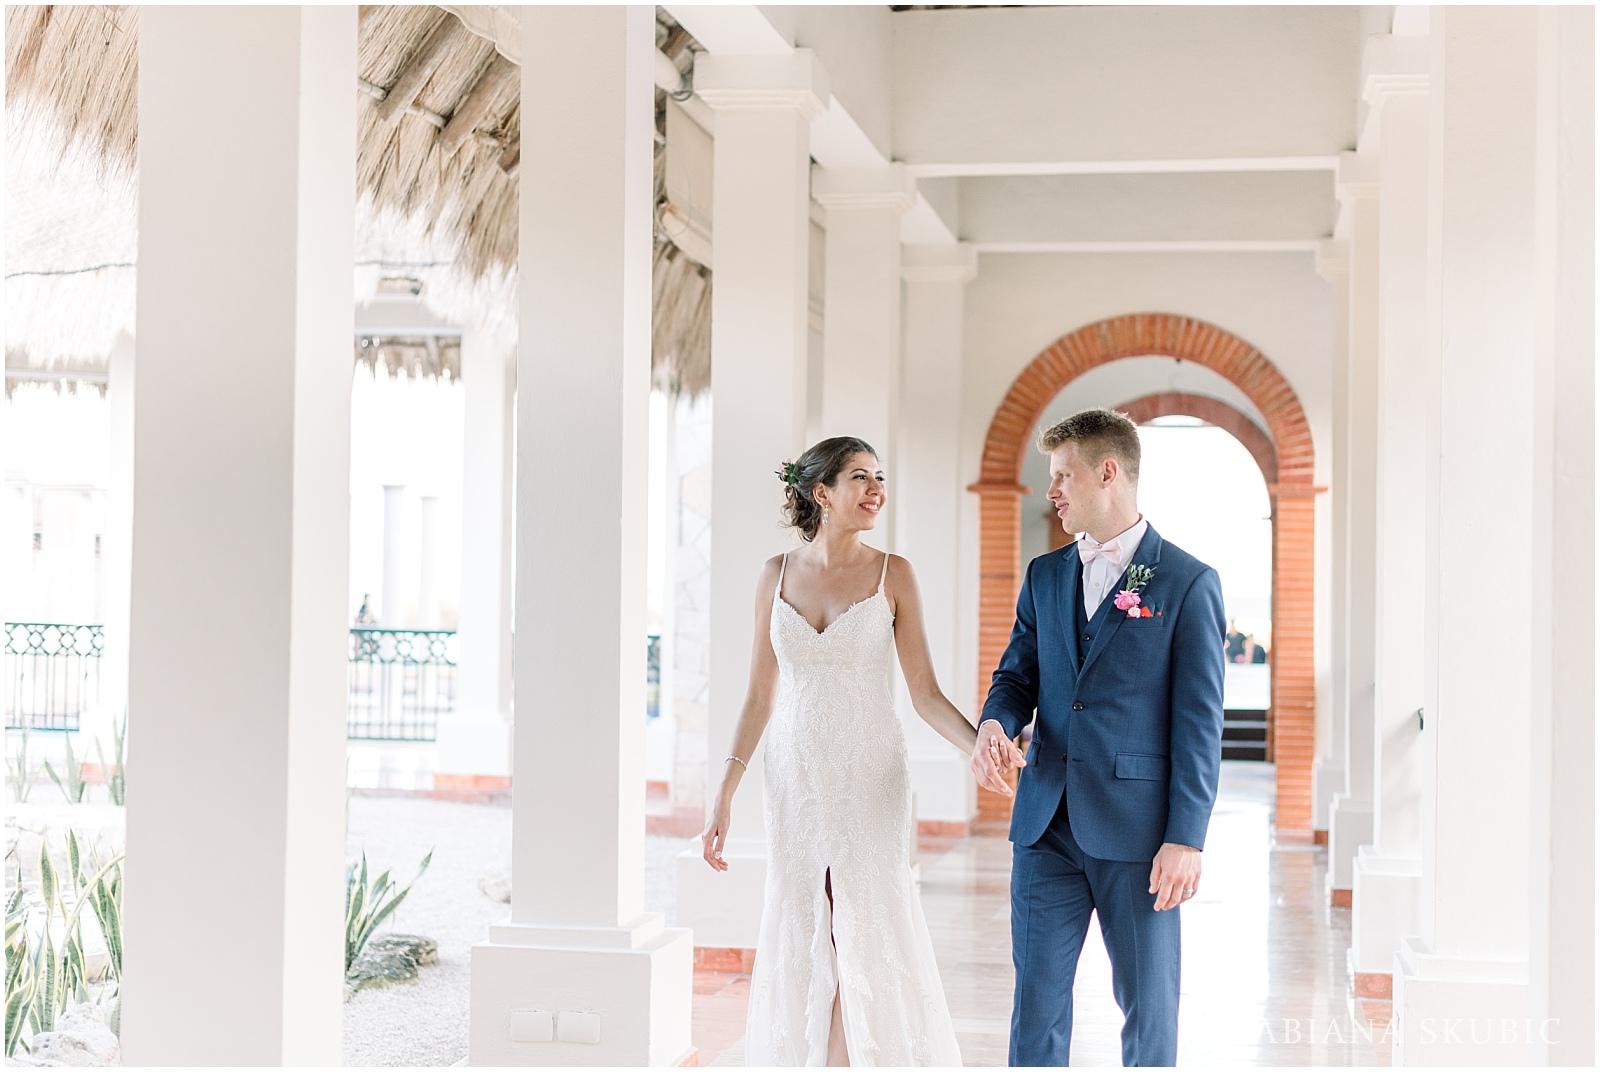 TJ_Now_Sapphire_Riviera_Cancun_Mexico_Wedding_Photos_0272.jpg